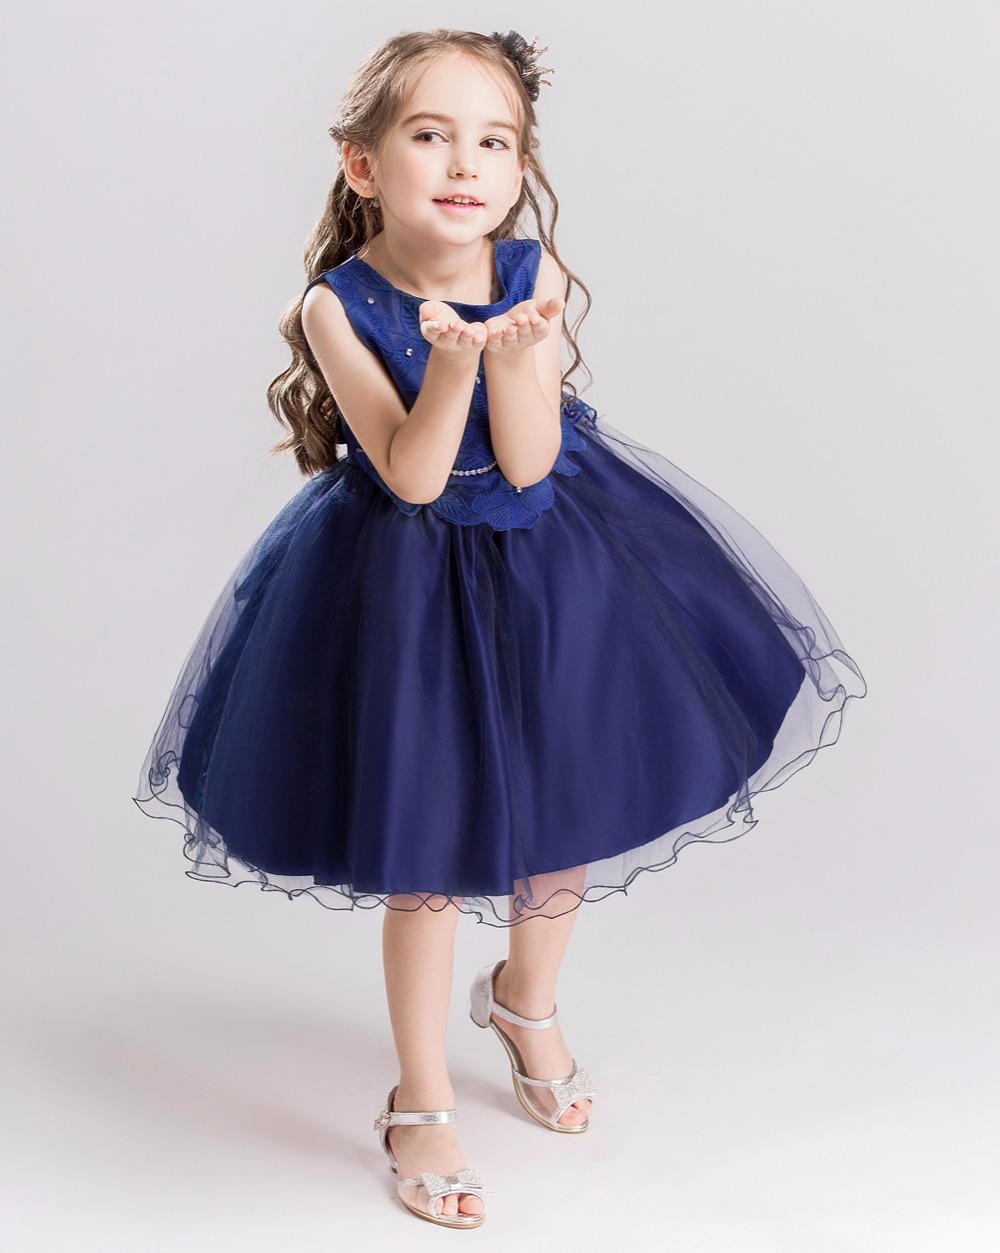 Jurk Bruiloft Blauw.Hoogwaardige Borduurwerk Bloem Meisje Jurk Blauw Kleur Kinderen